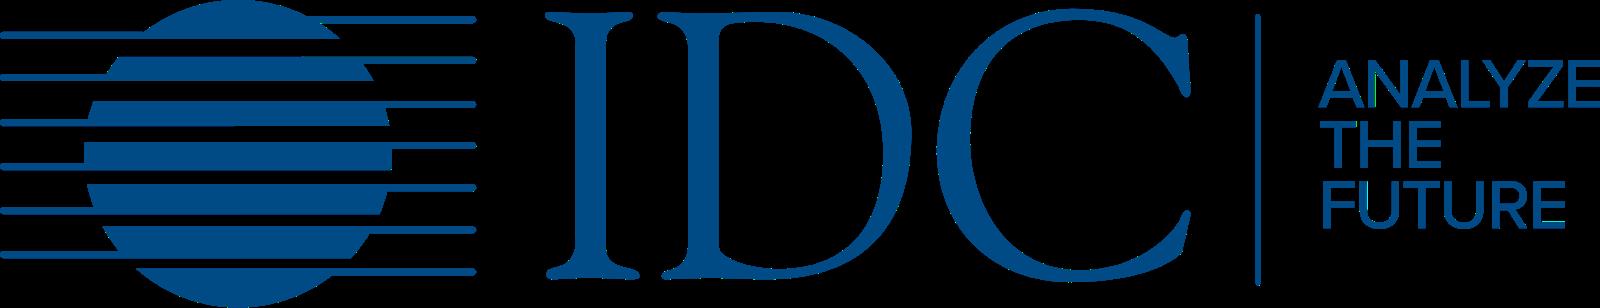 IDC-logo-horizontal